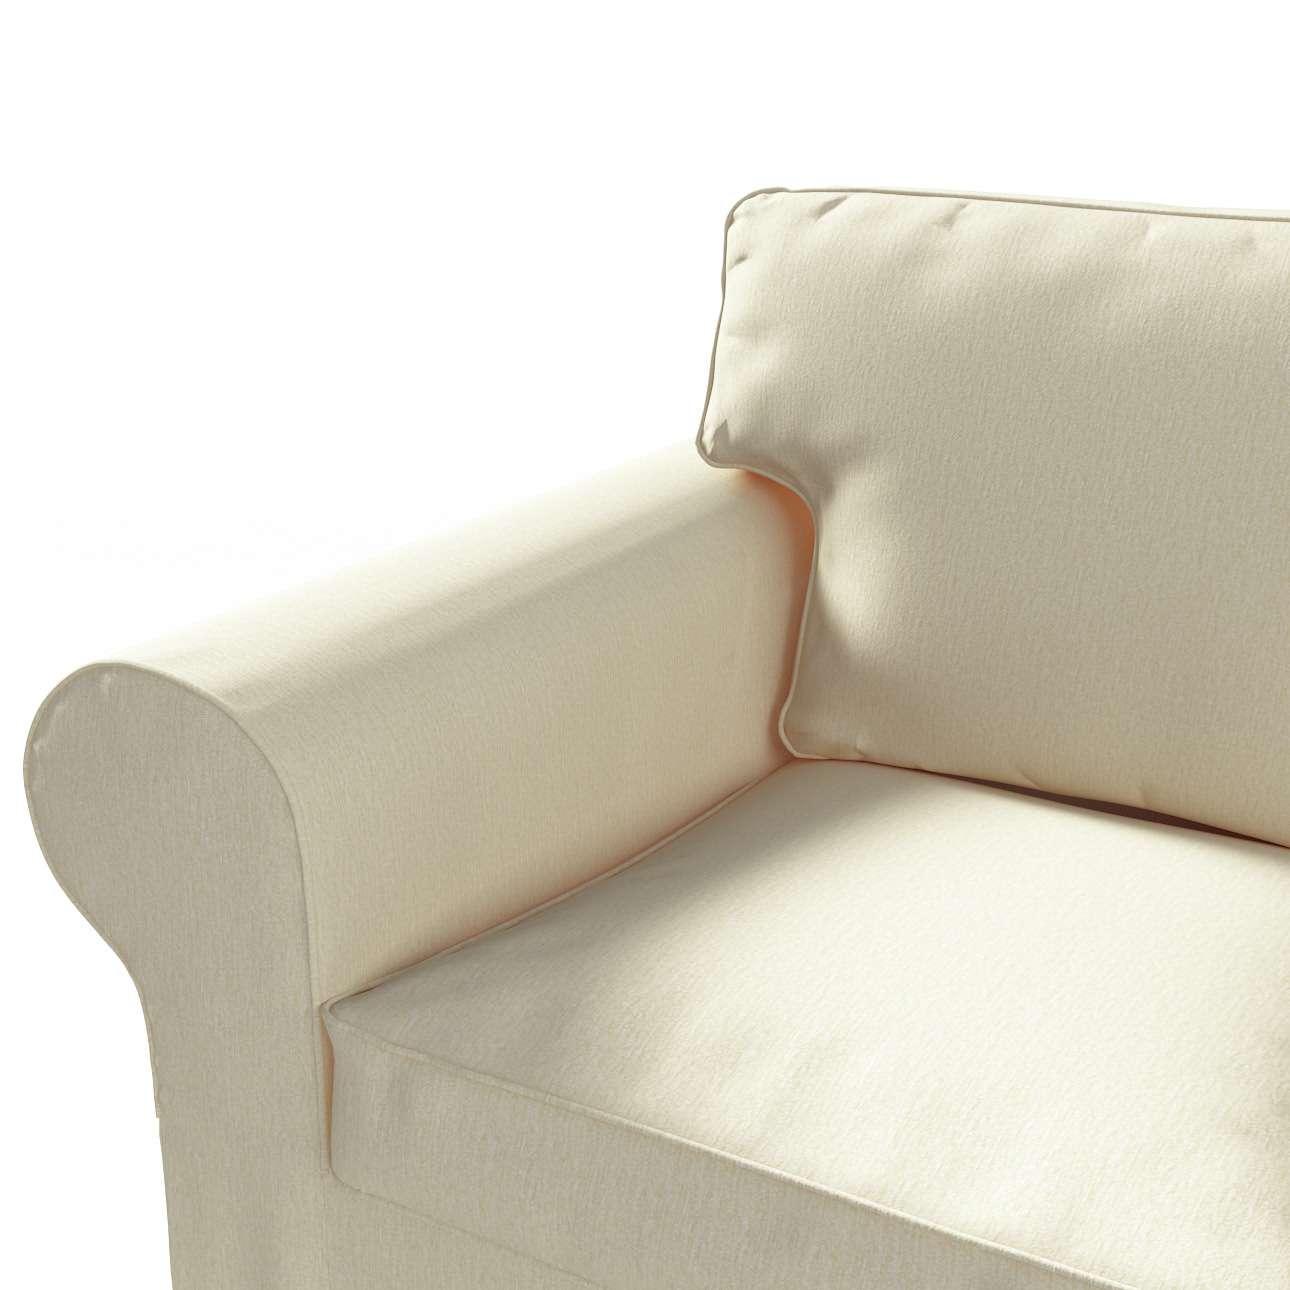 Ektorp 3-Sitzer Schlafsofabezug, ALTES Modell Sofahusse Ektorp 3-Sitzer Schlafsofa von der Kollektion Chenille , Stoff: 702-22